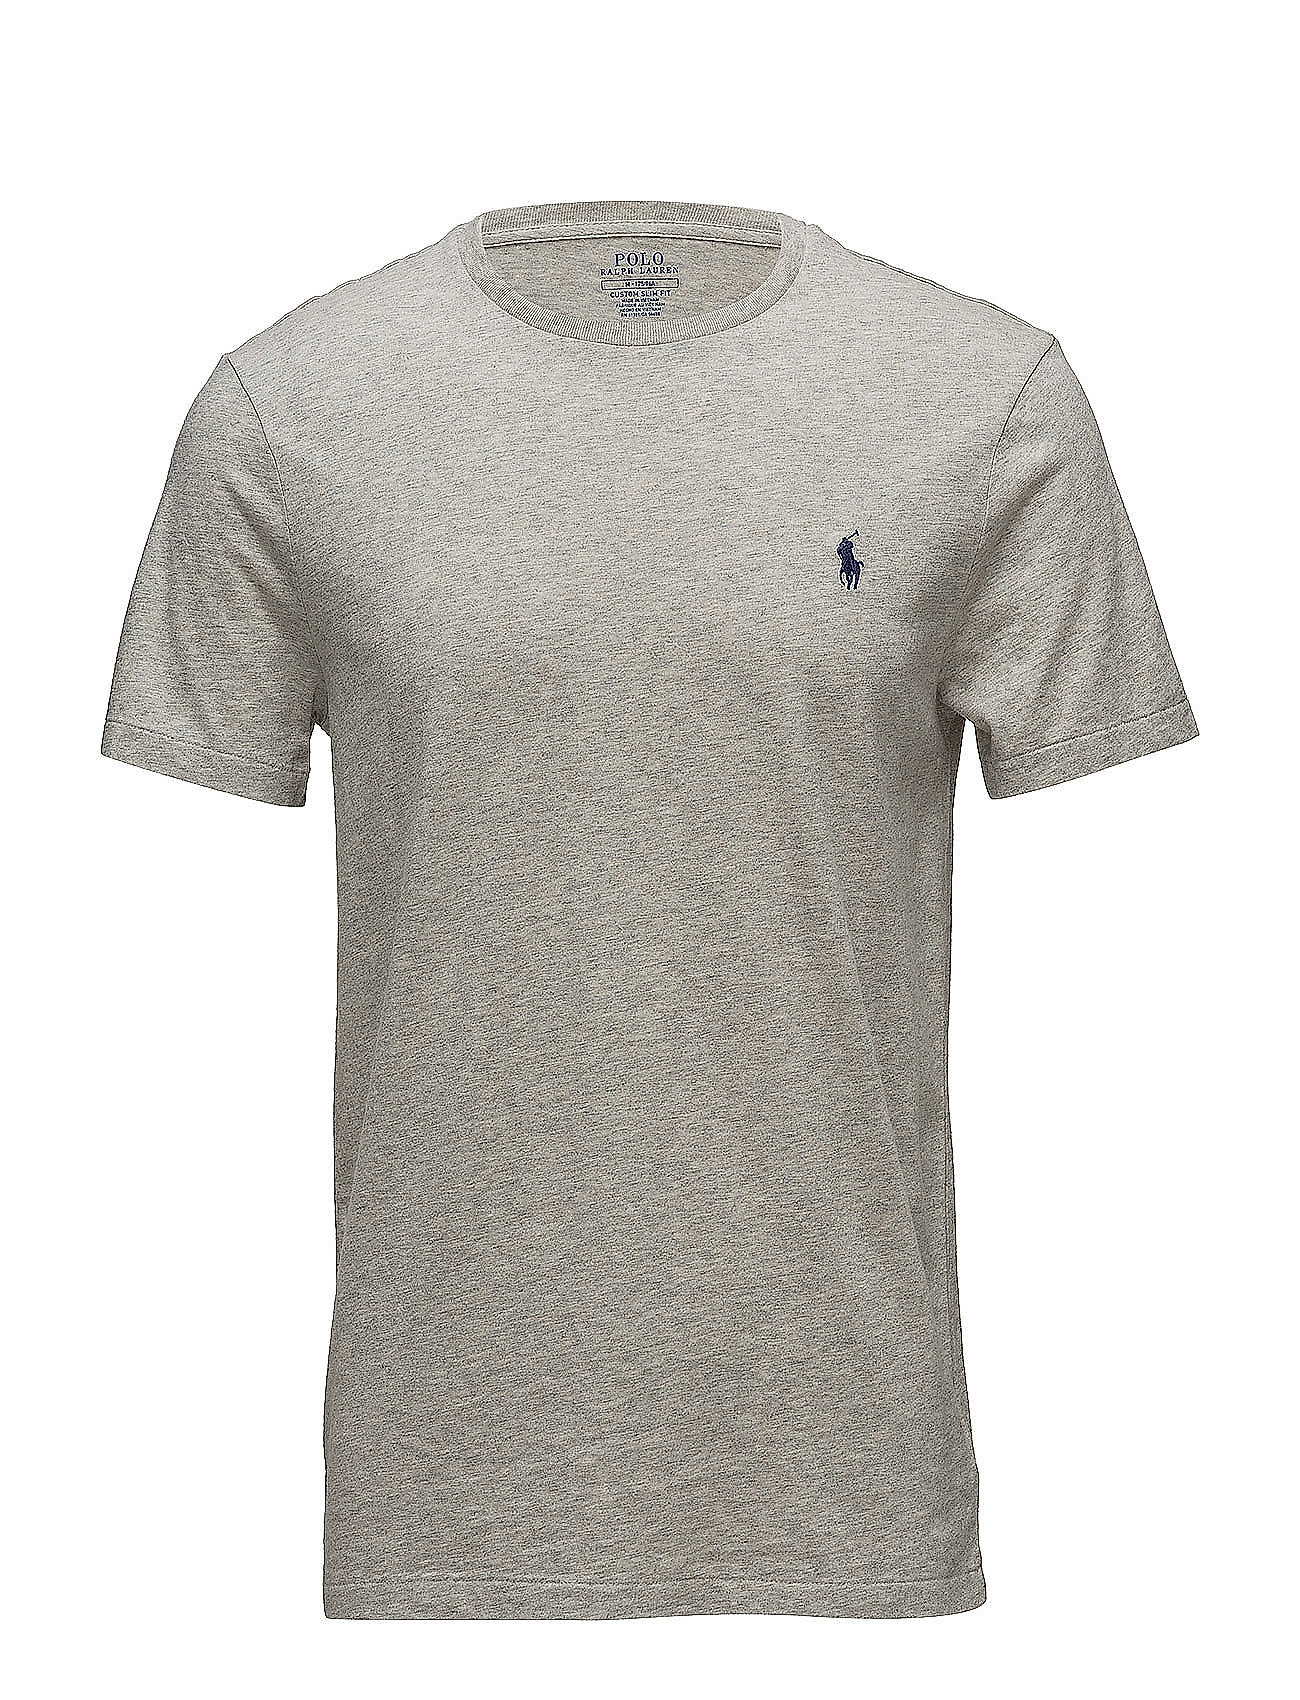 T Grey HeatherPolo Cotton Slim Custom Lauren shirtnew Ralph u13FJlTKc